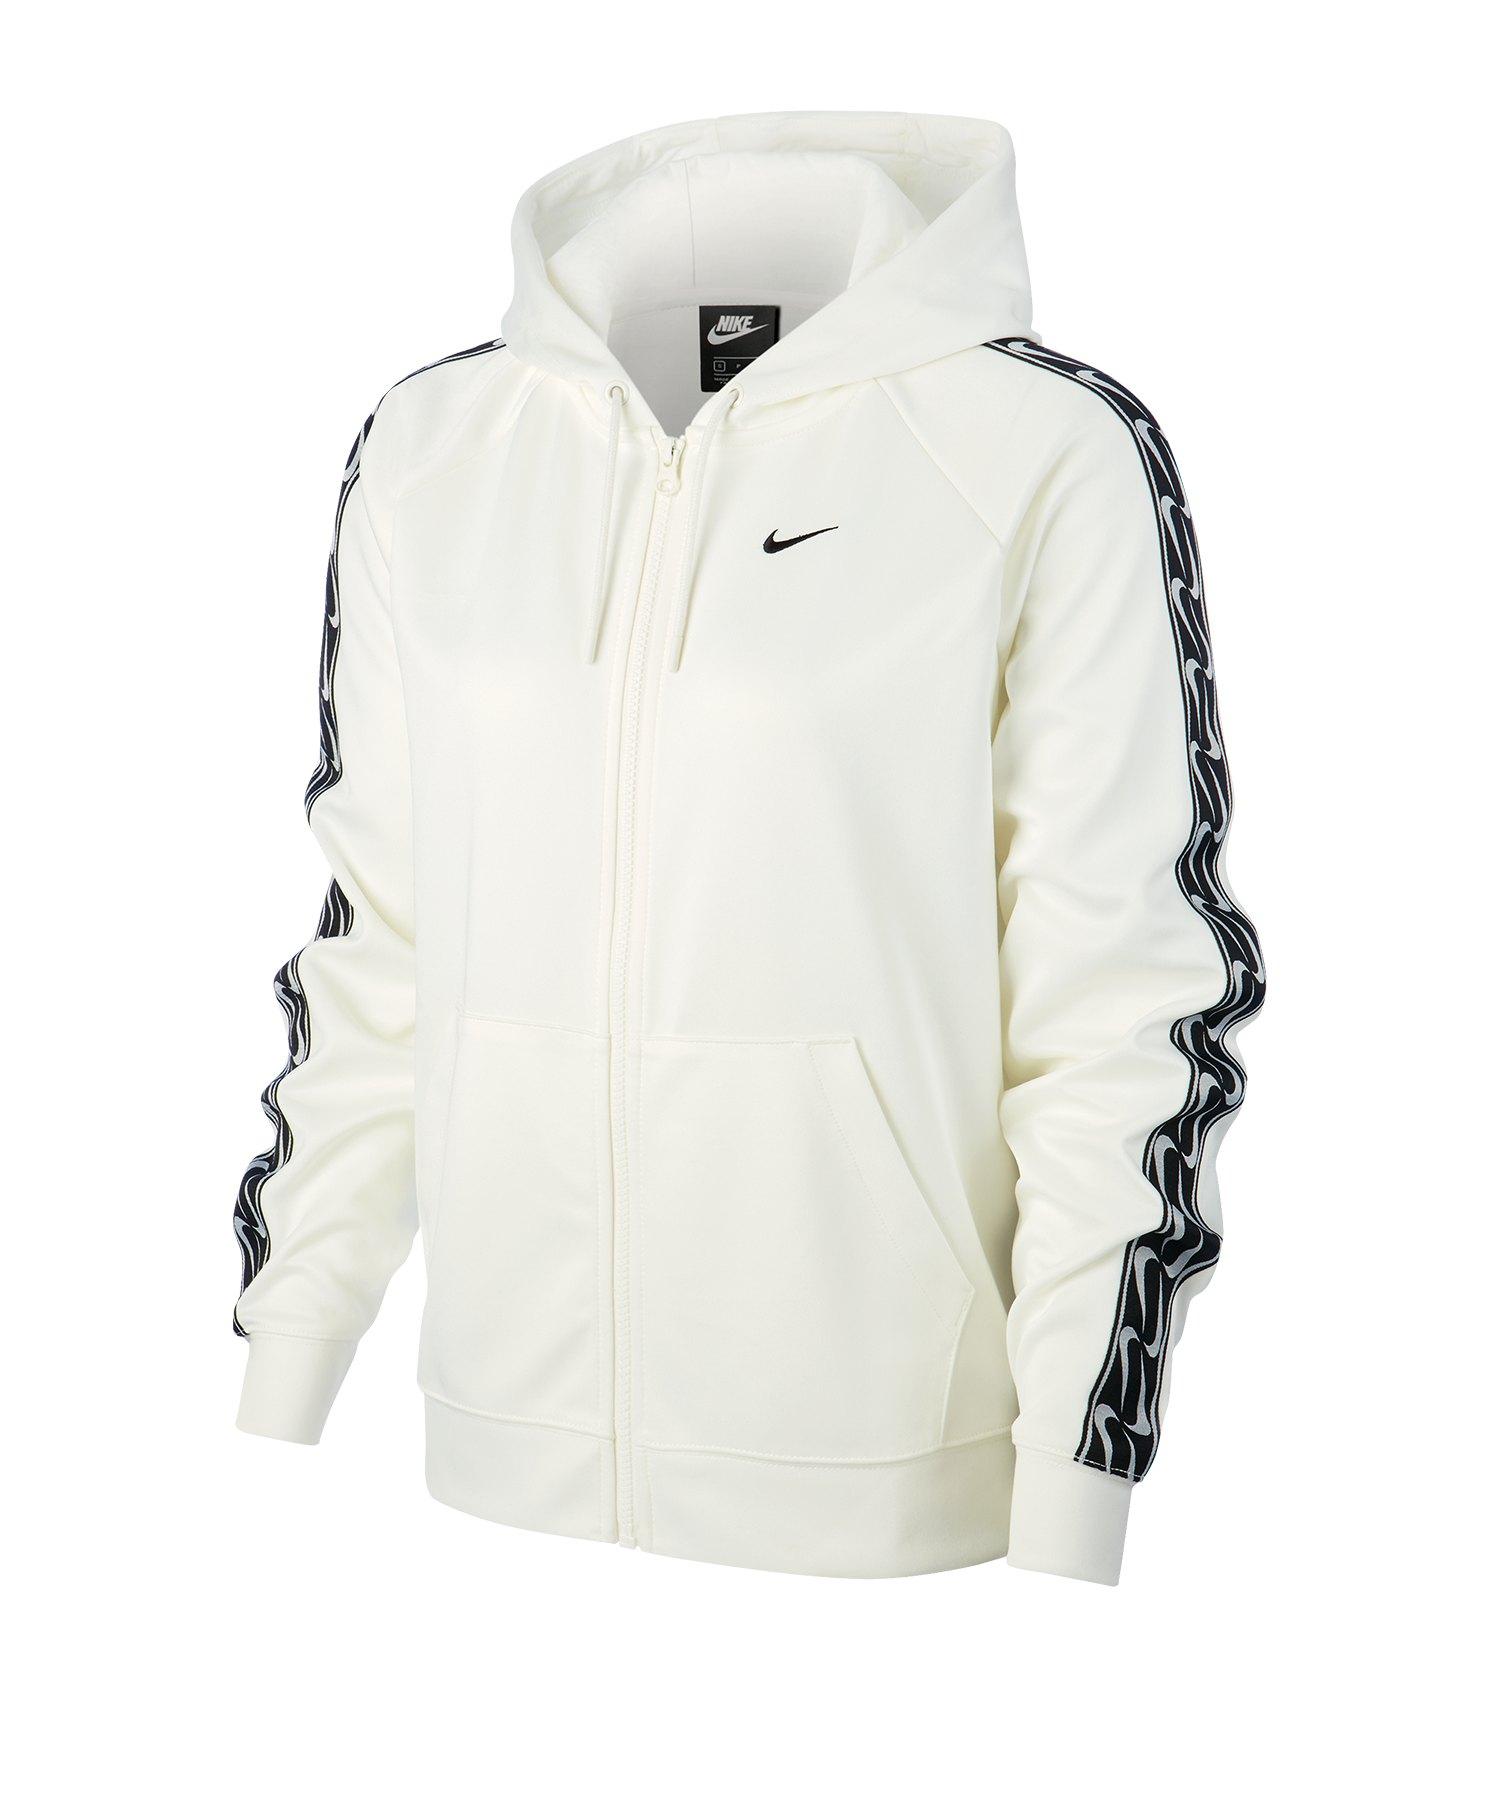 Nike Full-Zip Swoosh Kapuzenjacke Damen F010 - weiss